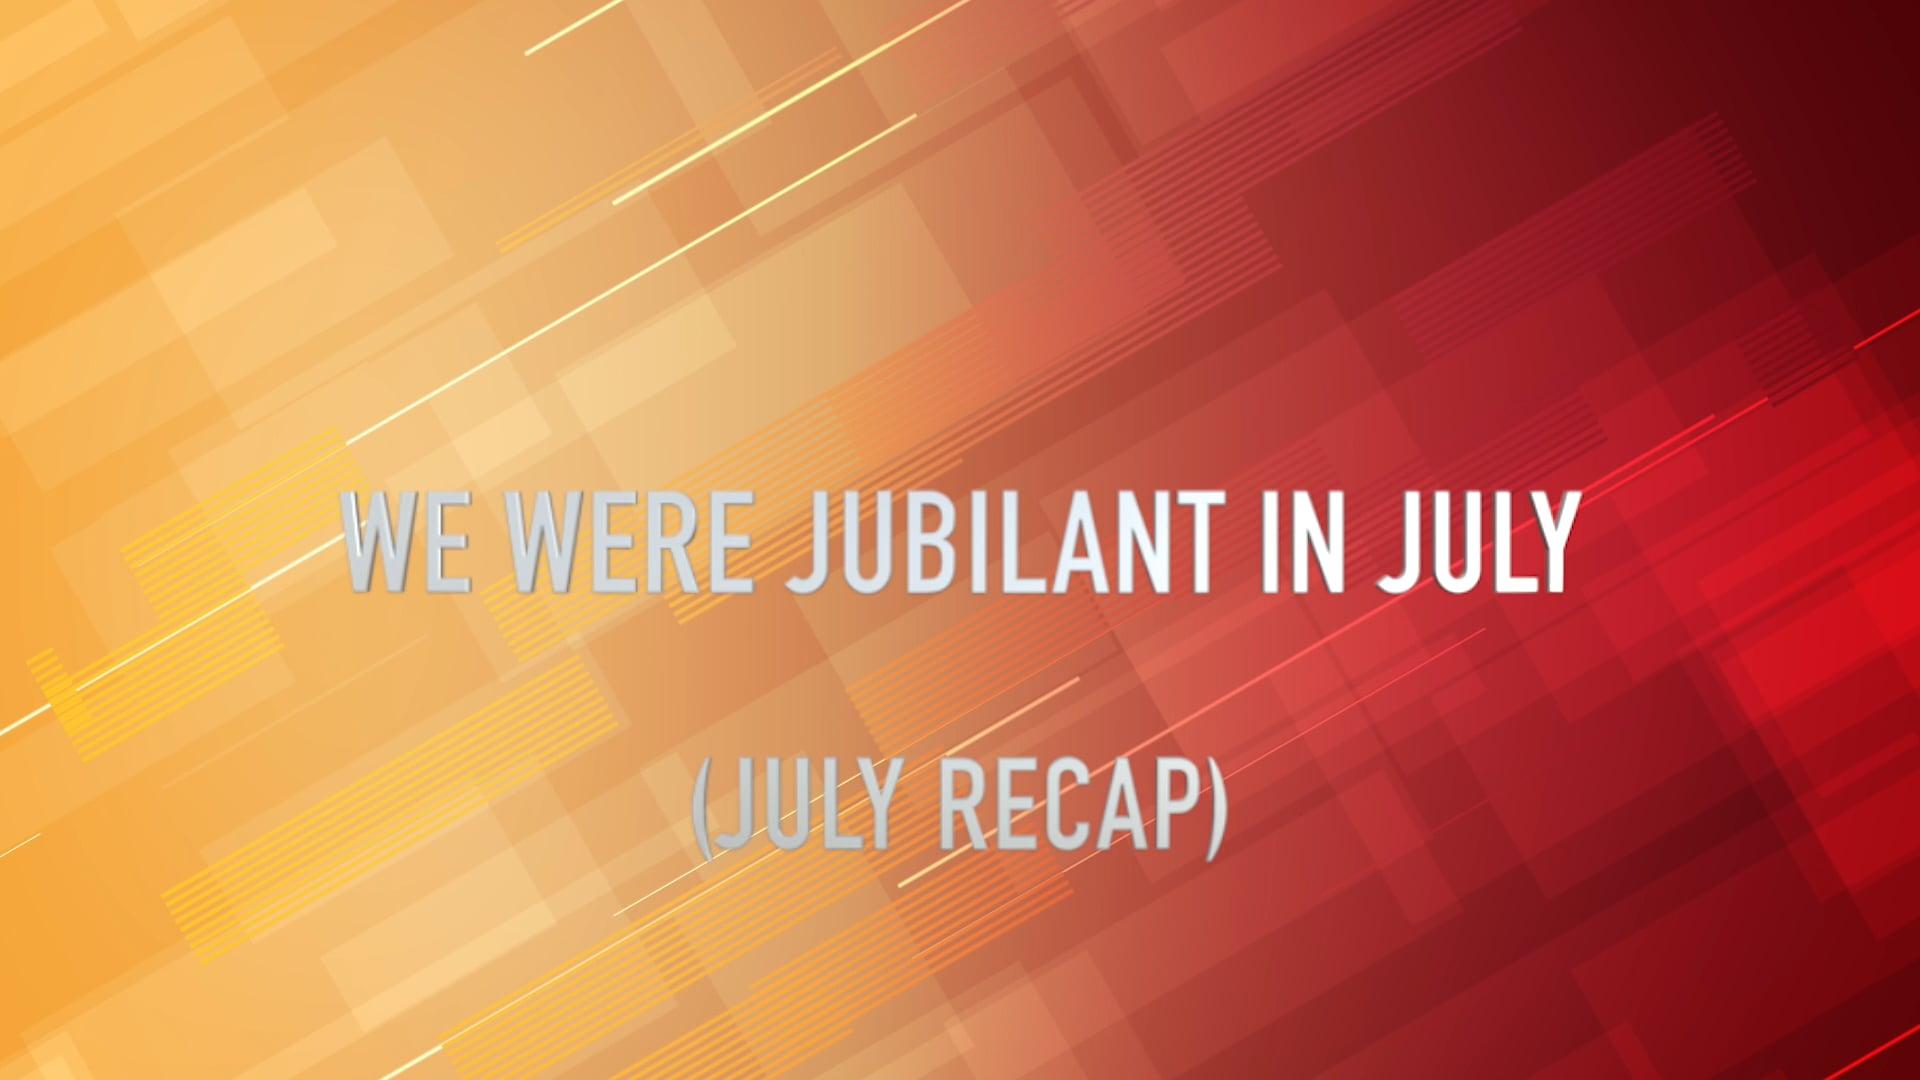 Jubilant in July! - HD 1080p.mov